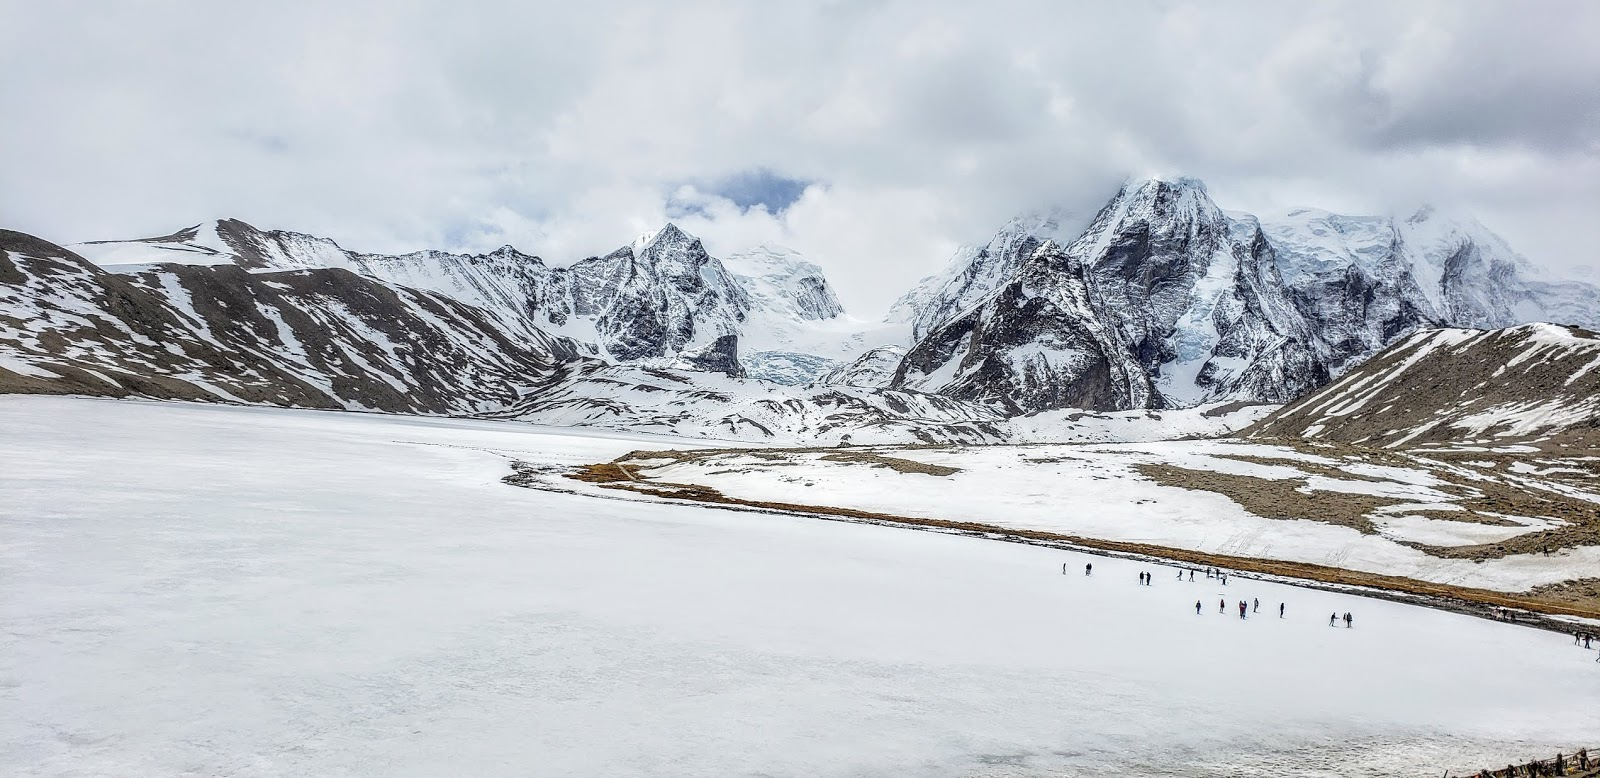 नार्थ सिक्किम का रोड ट्रिप - गुरुडोंगमार, लाचुंग, युमथांग